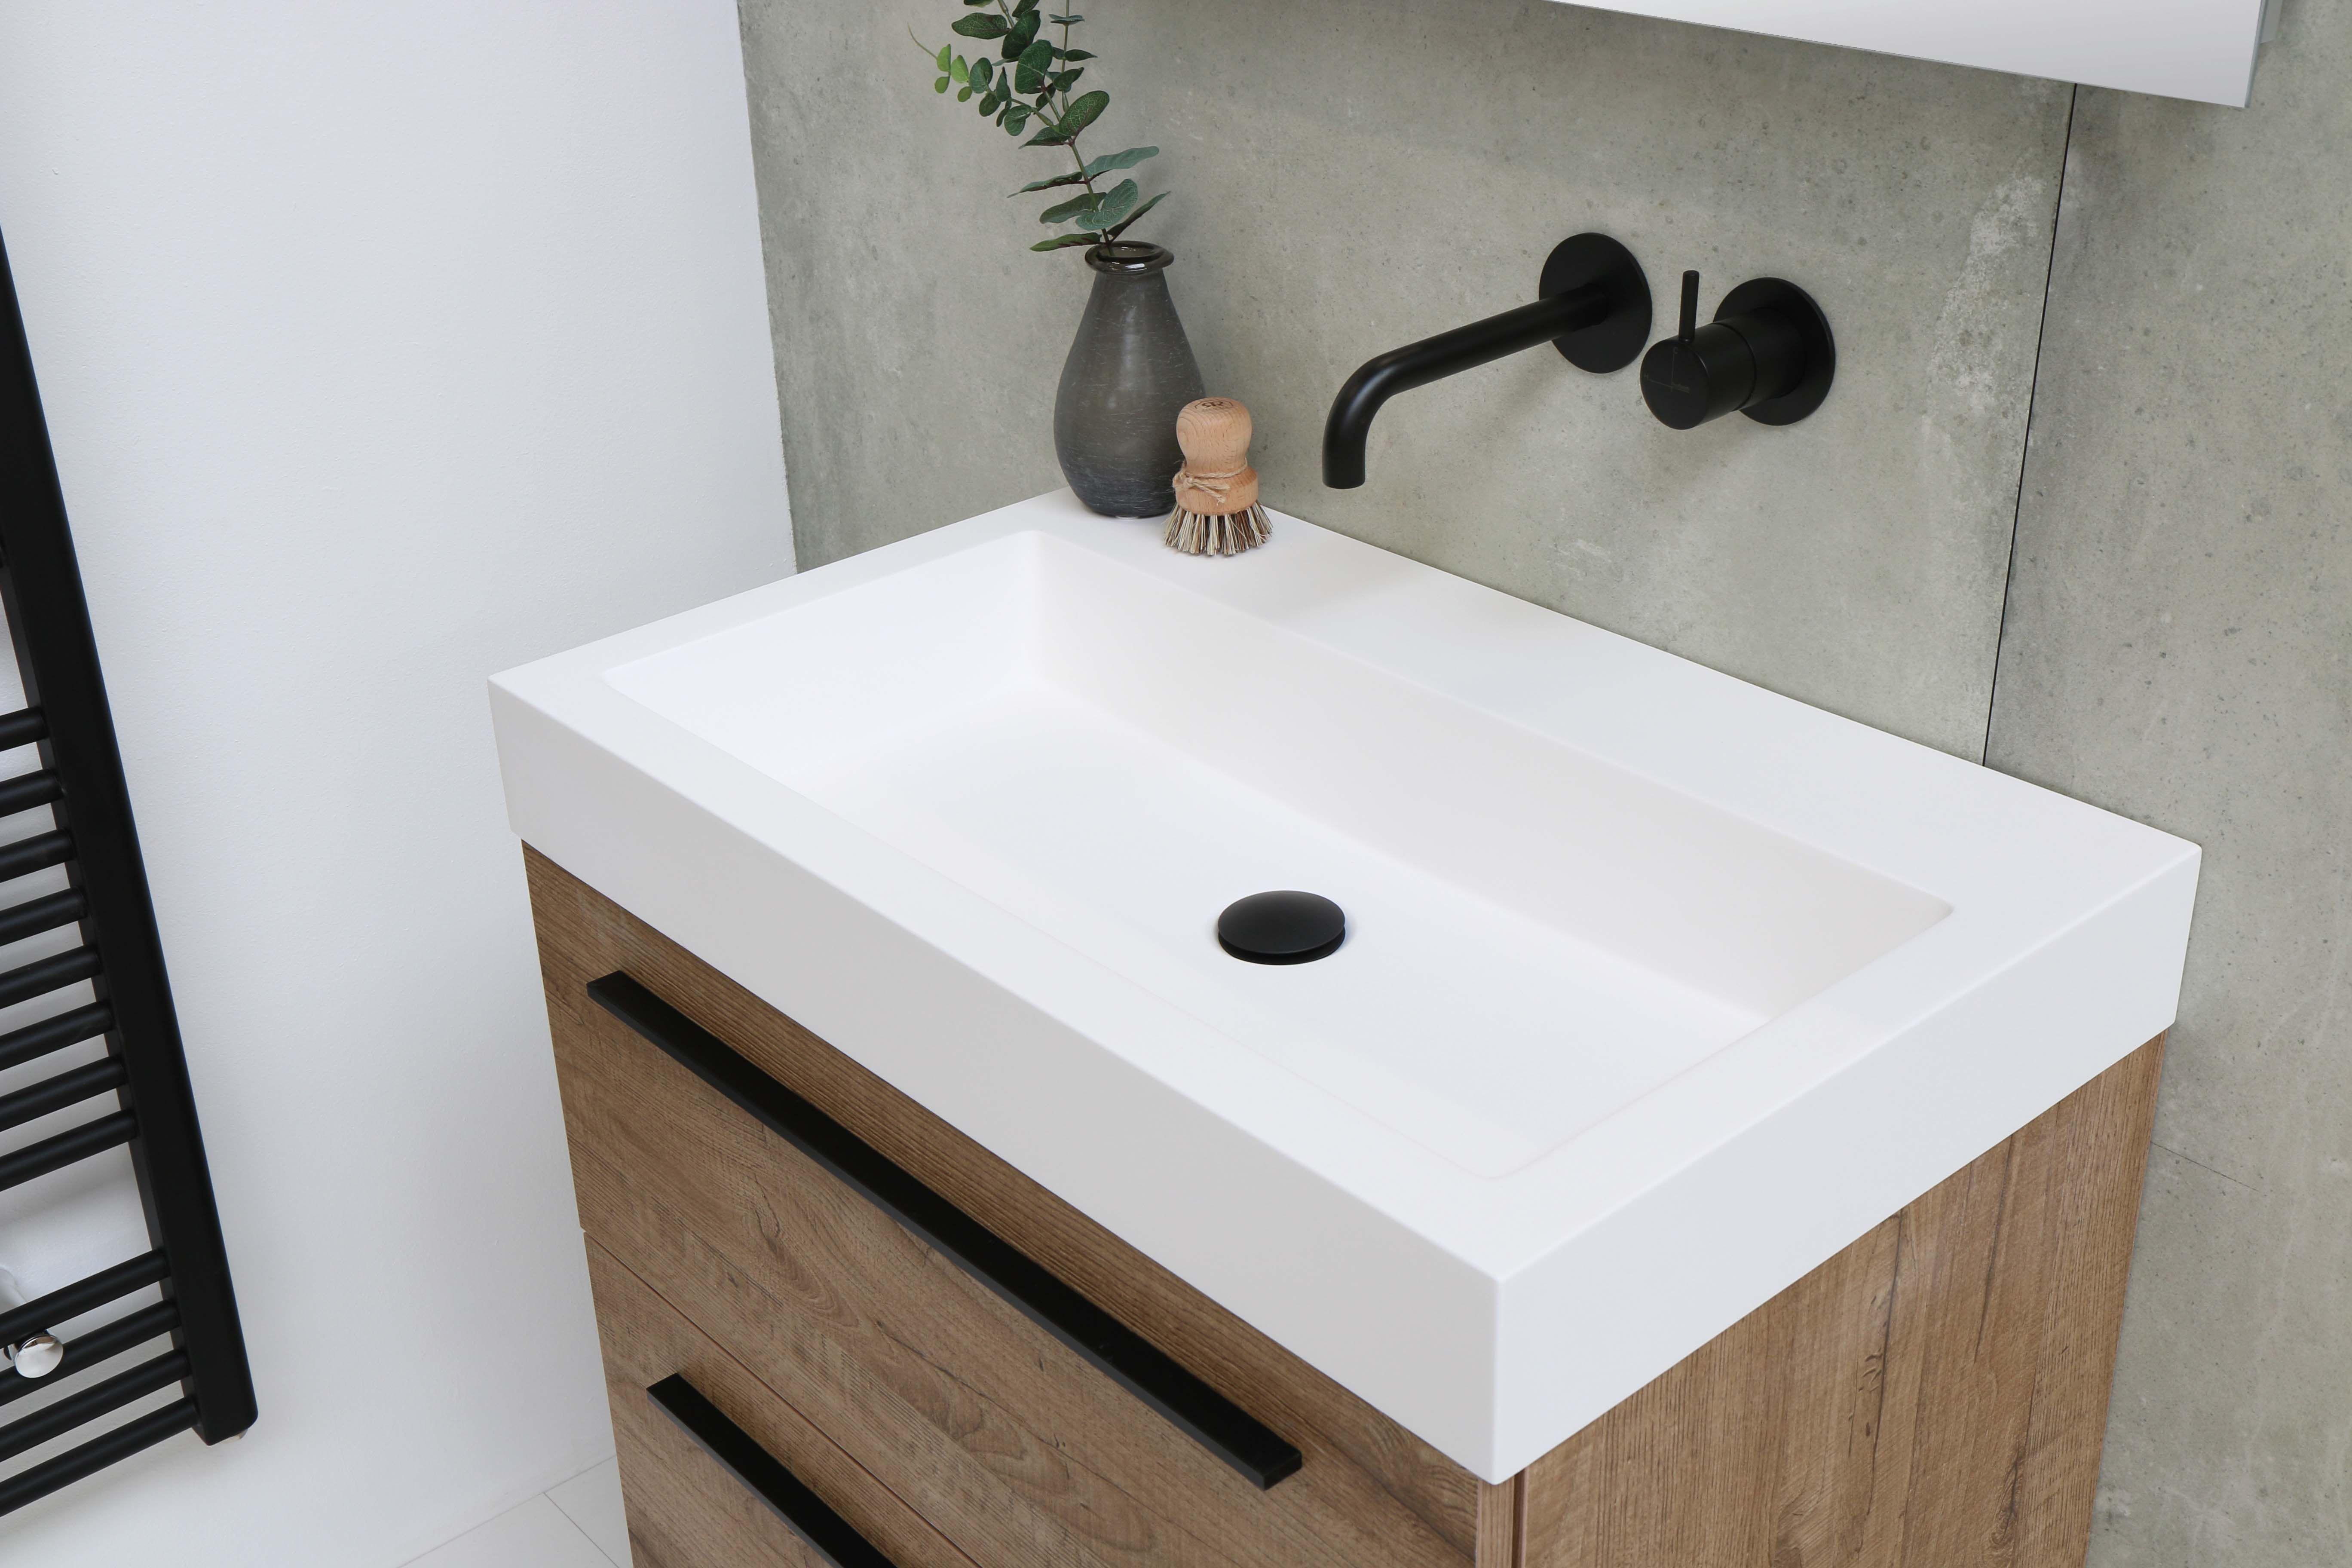 Wastafel 70 Cm : Mat wit cm onderkast met greep naturel eiken badkamer